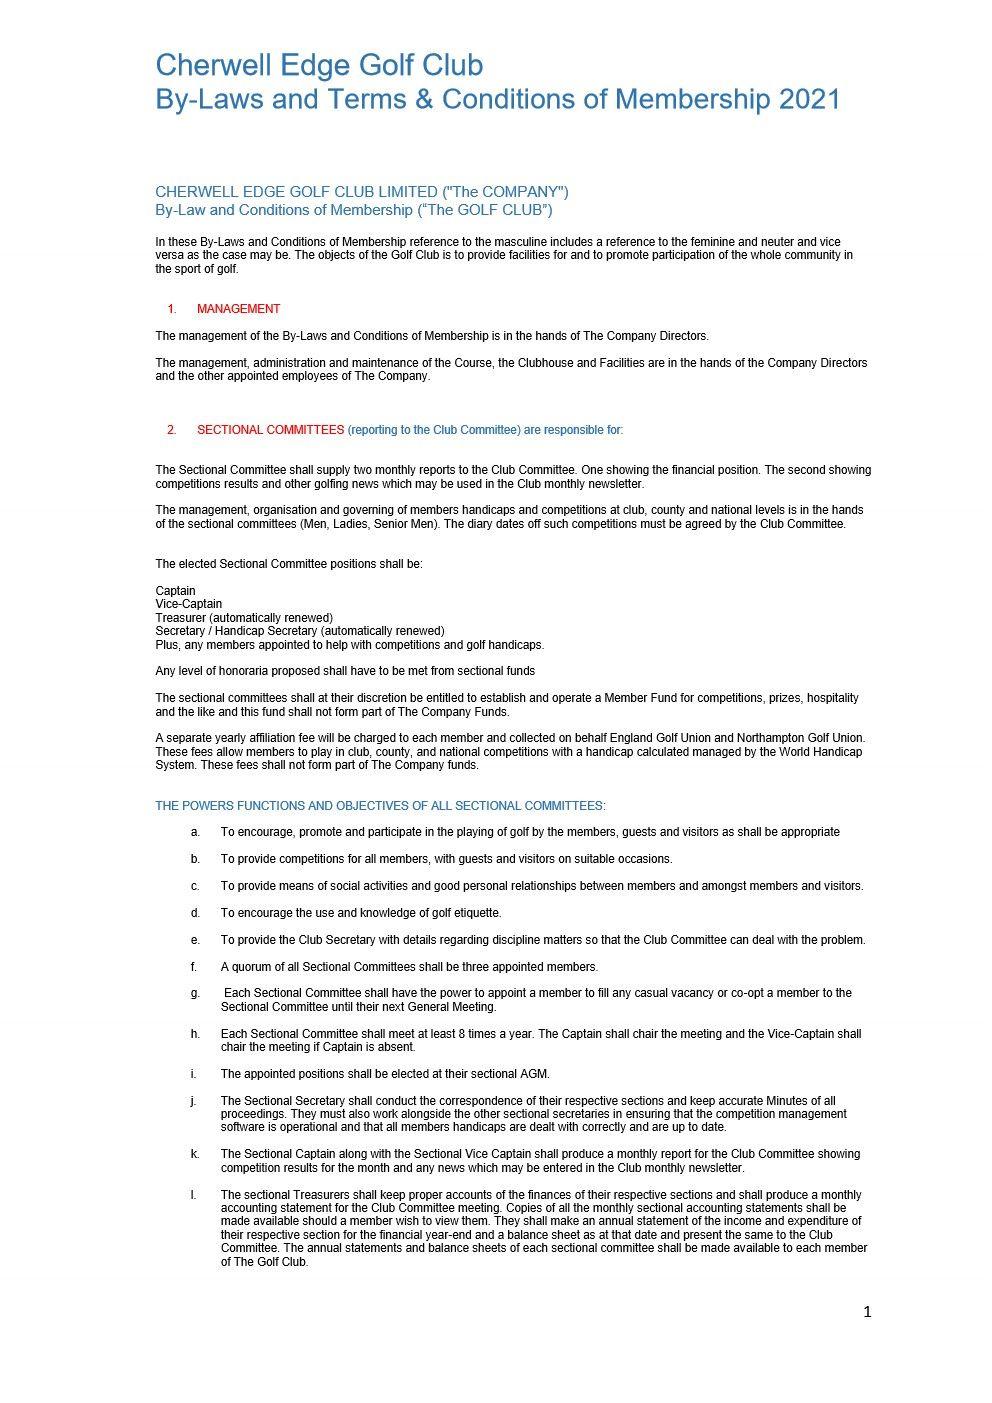 CHERWELL EDGE GOLF CLUB By Laws 2021 version FINAL_1